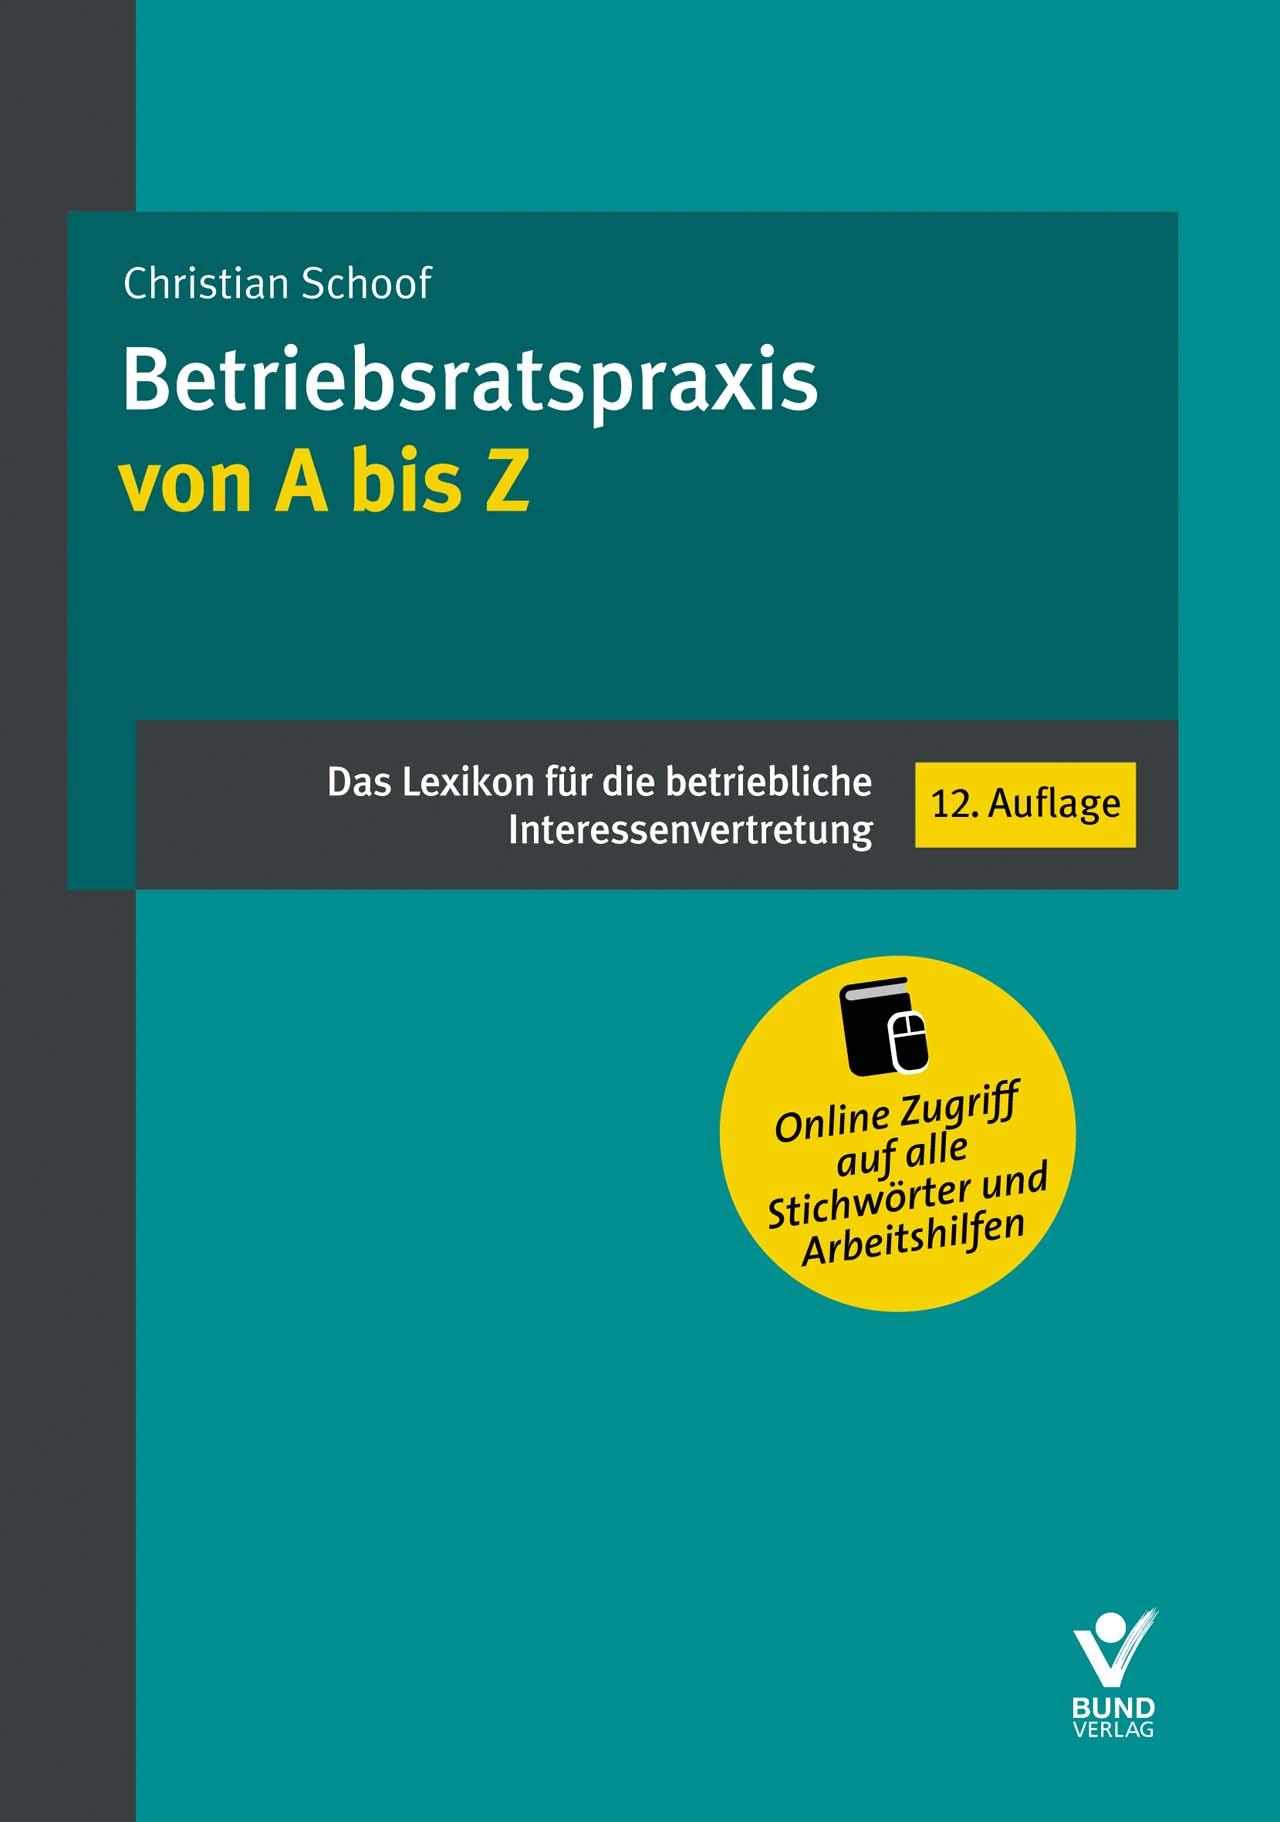 Christian-Schoof-Betriebsratspraxis-von-A-bis-Z-9783766364968